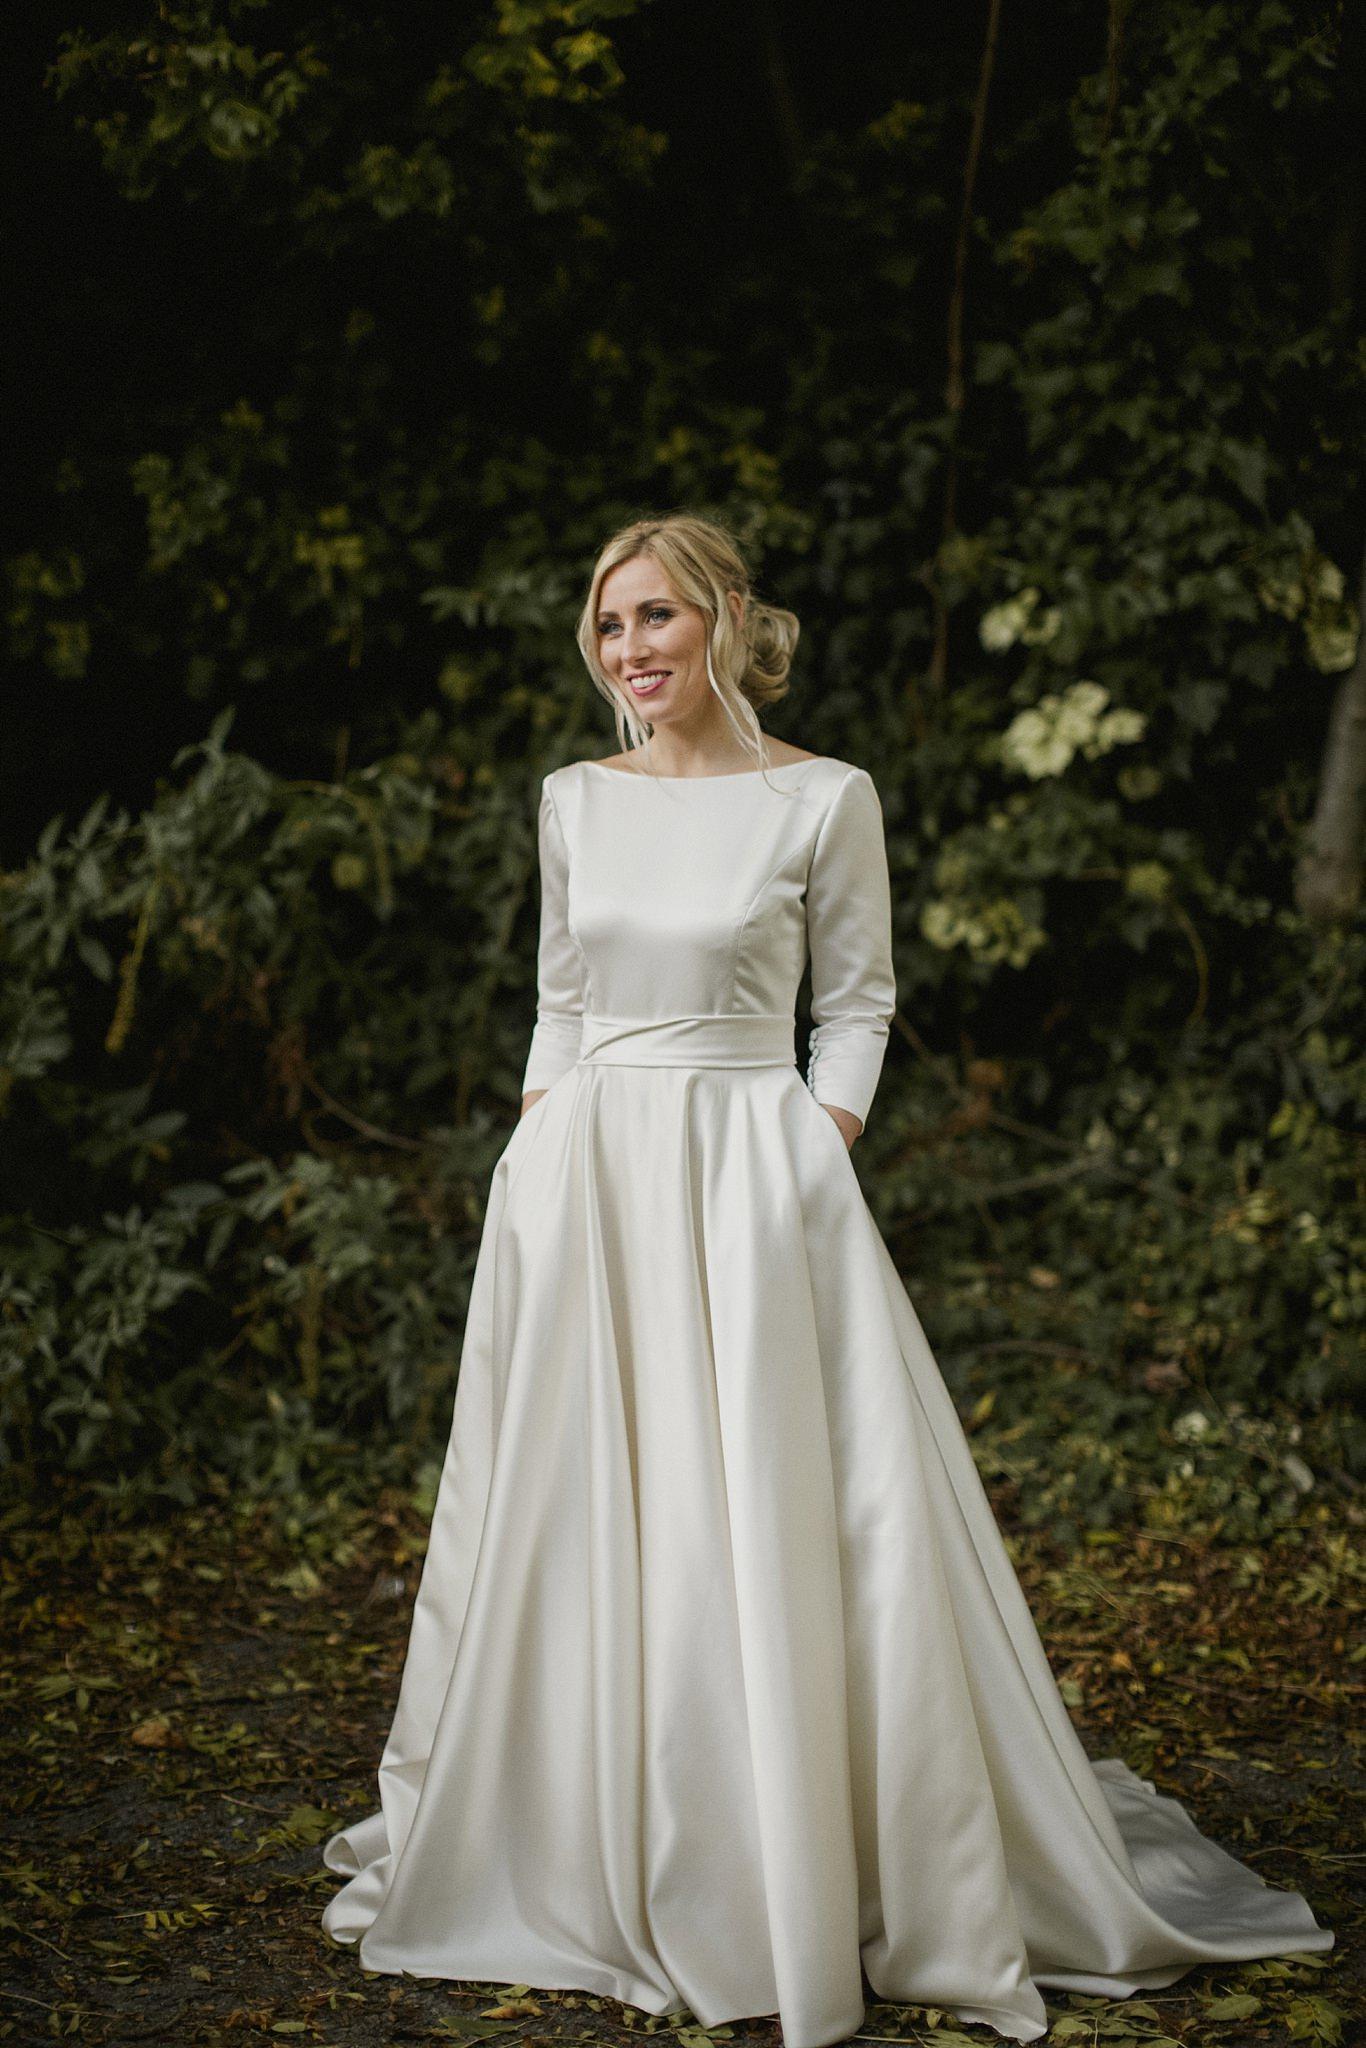 Sheffield_Wedding_Photography_0033.jpg